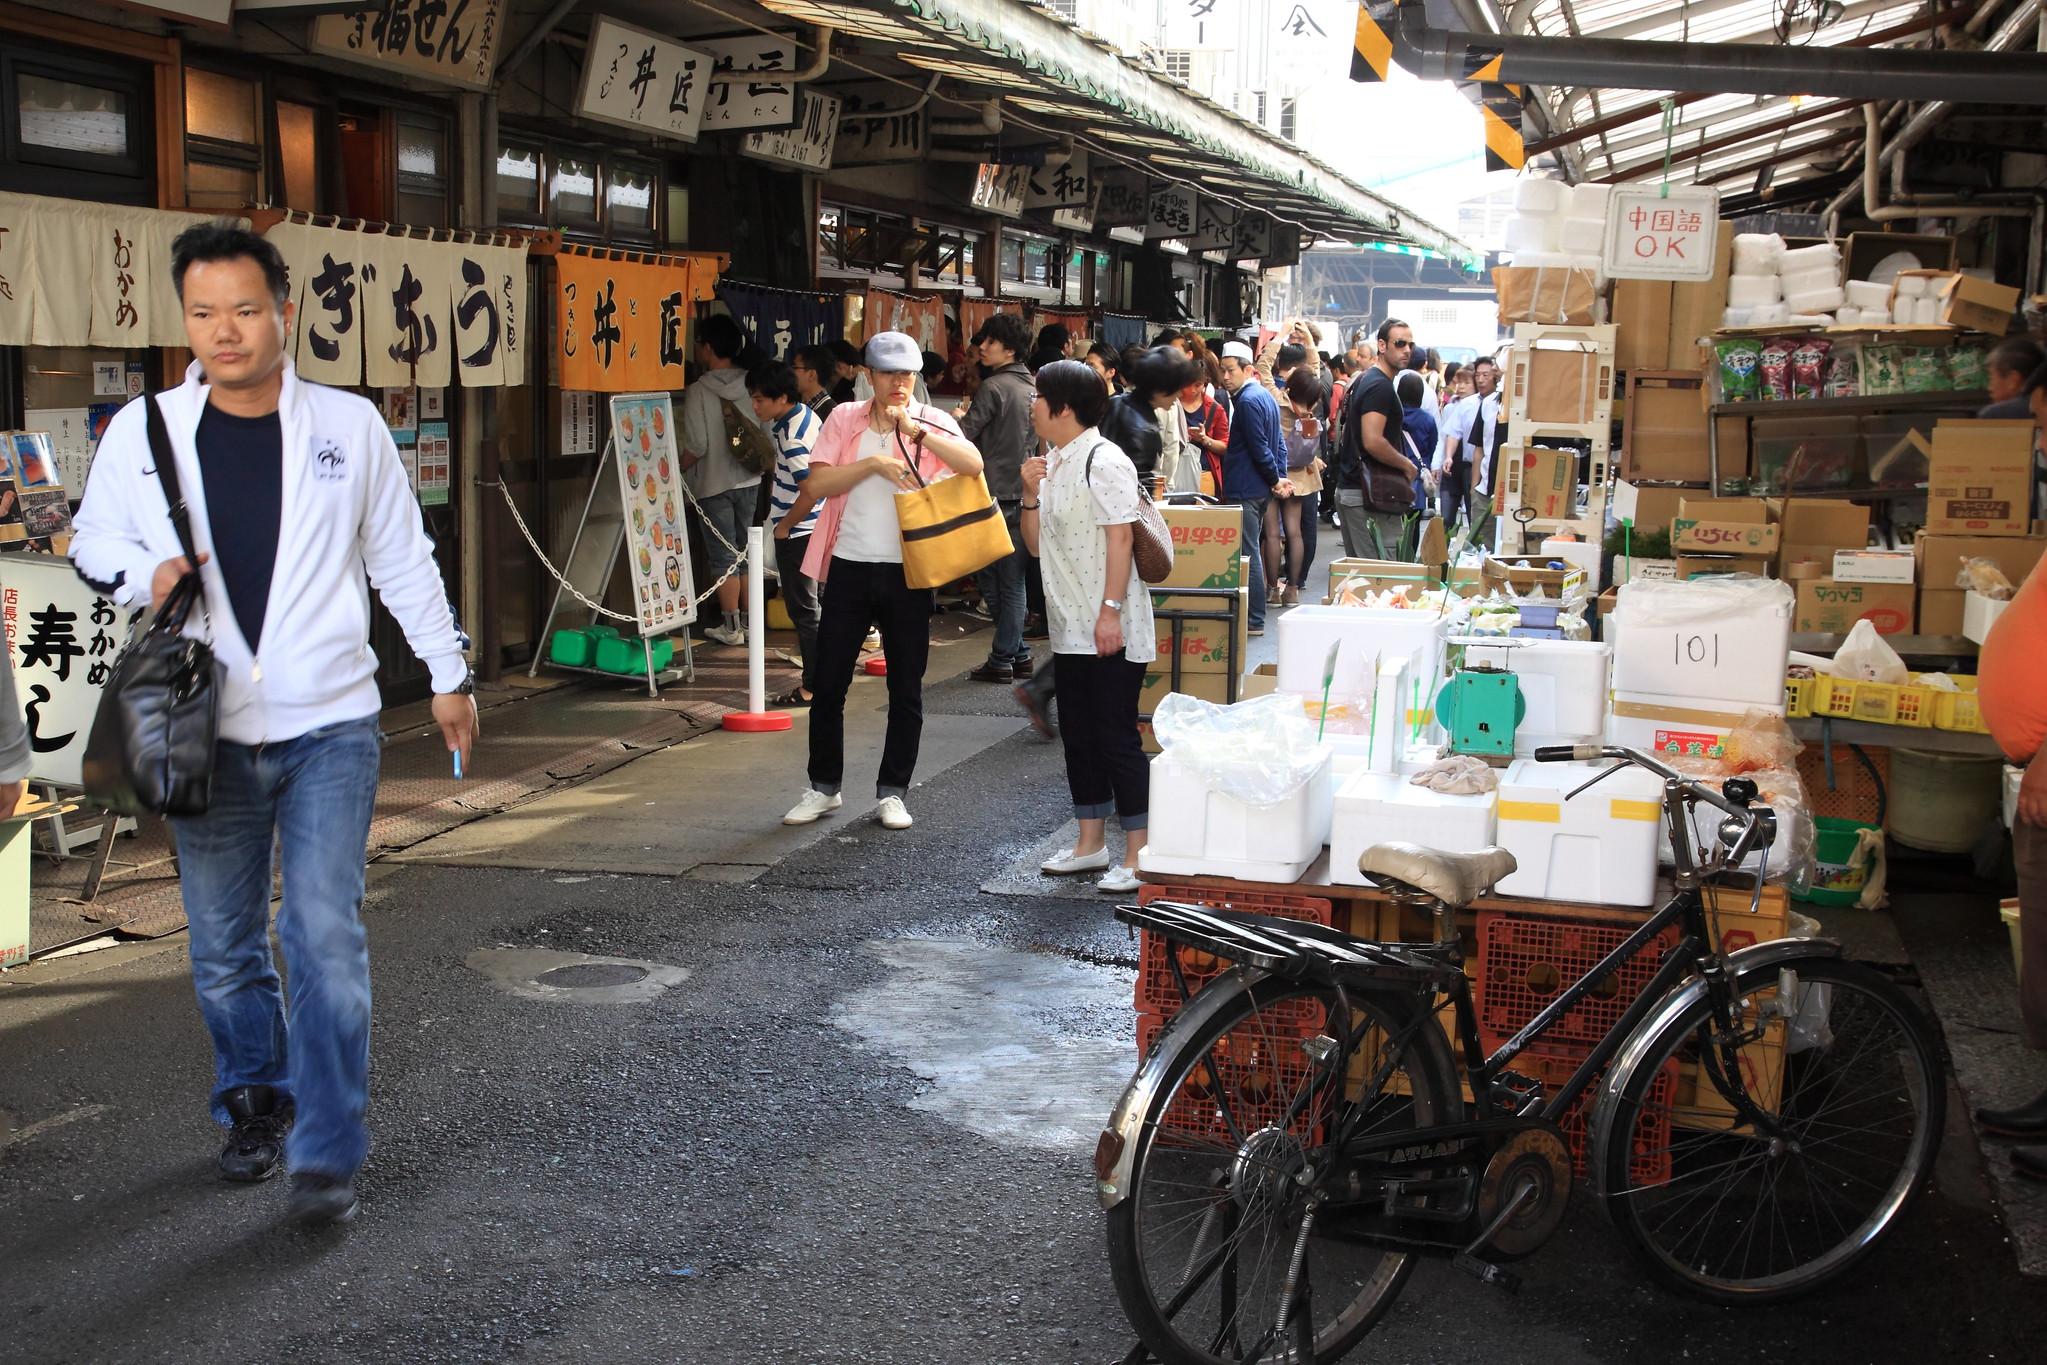 06102019_galeria-tsukiji stuart hamilton.jpg